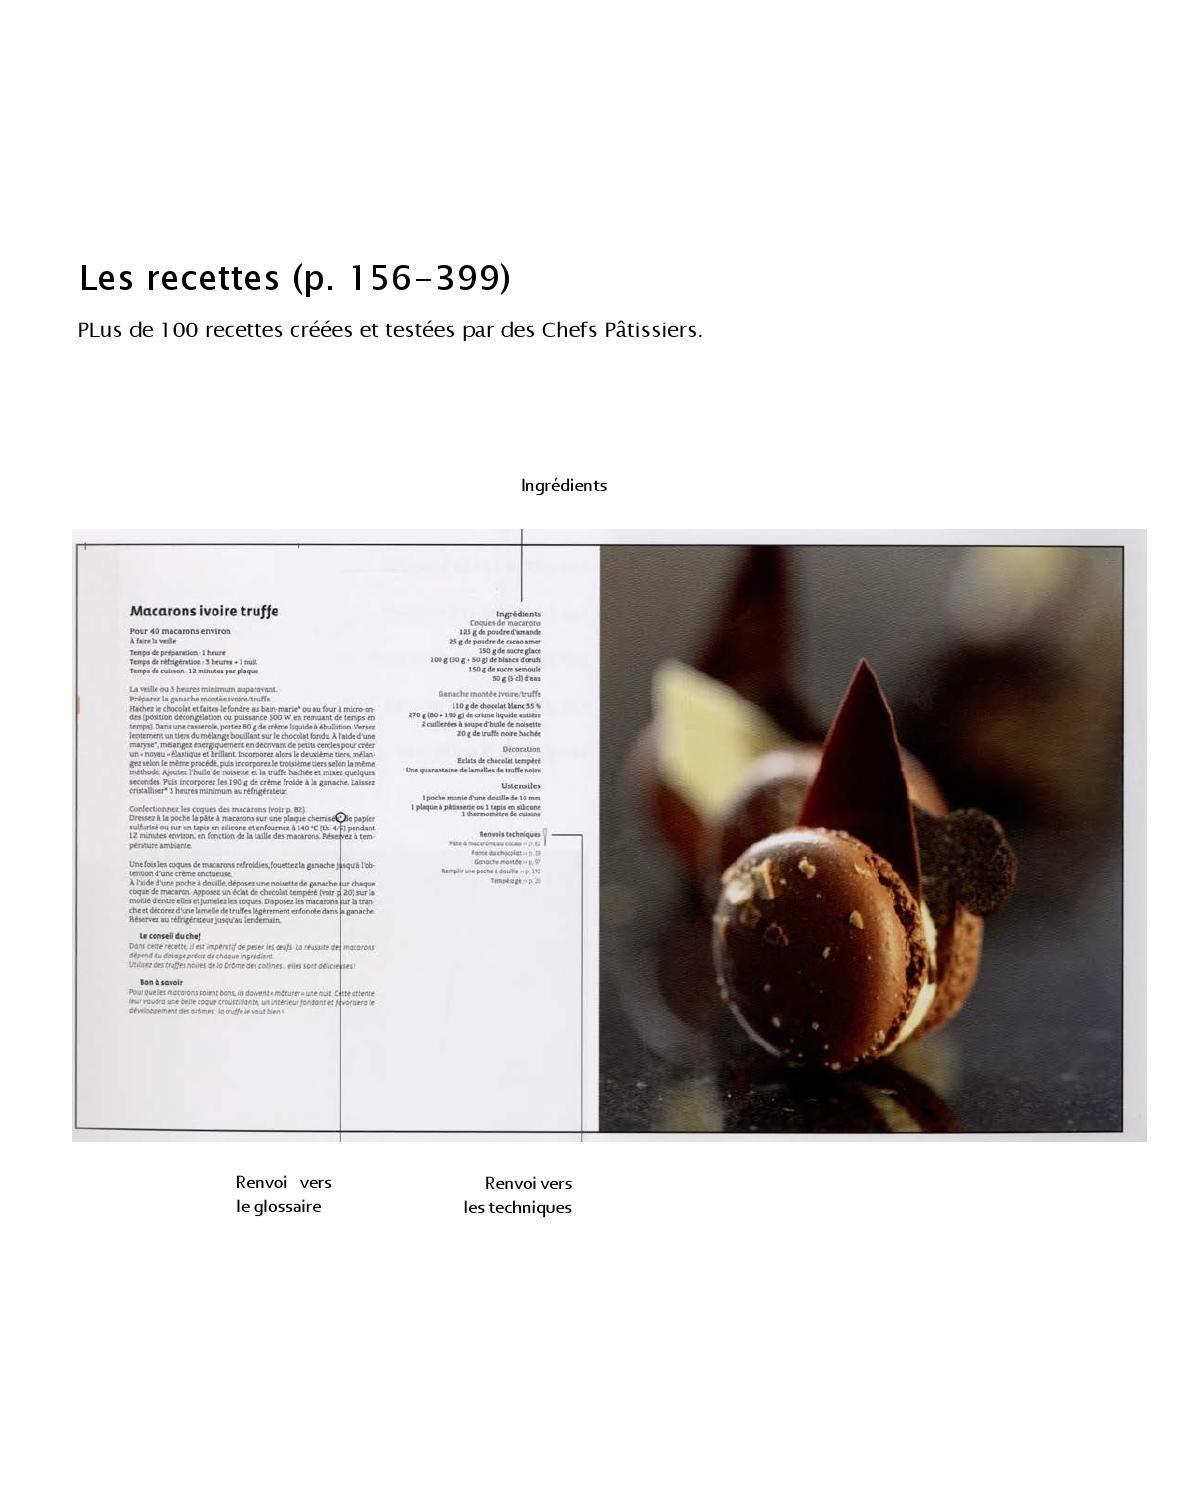 Bau Frederic Encyclopedie Du Chocolat Pastry Recipes Make It Simple Bau